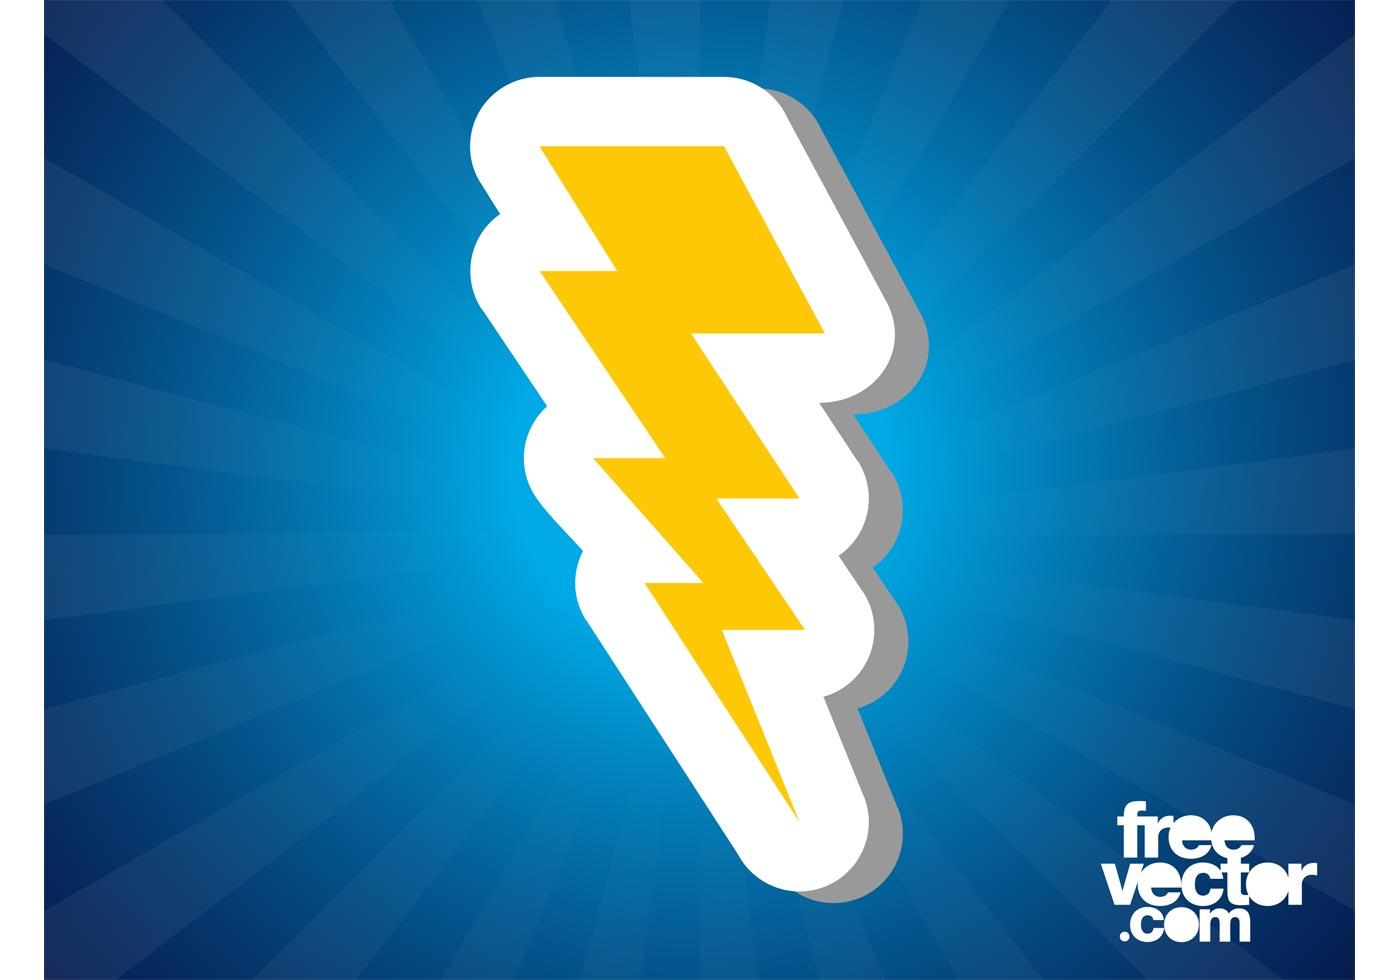 Lightning Bolt Icon Download Free Vector Art Stock